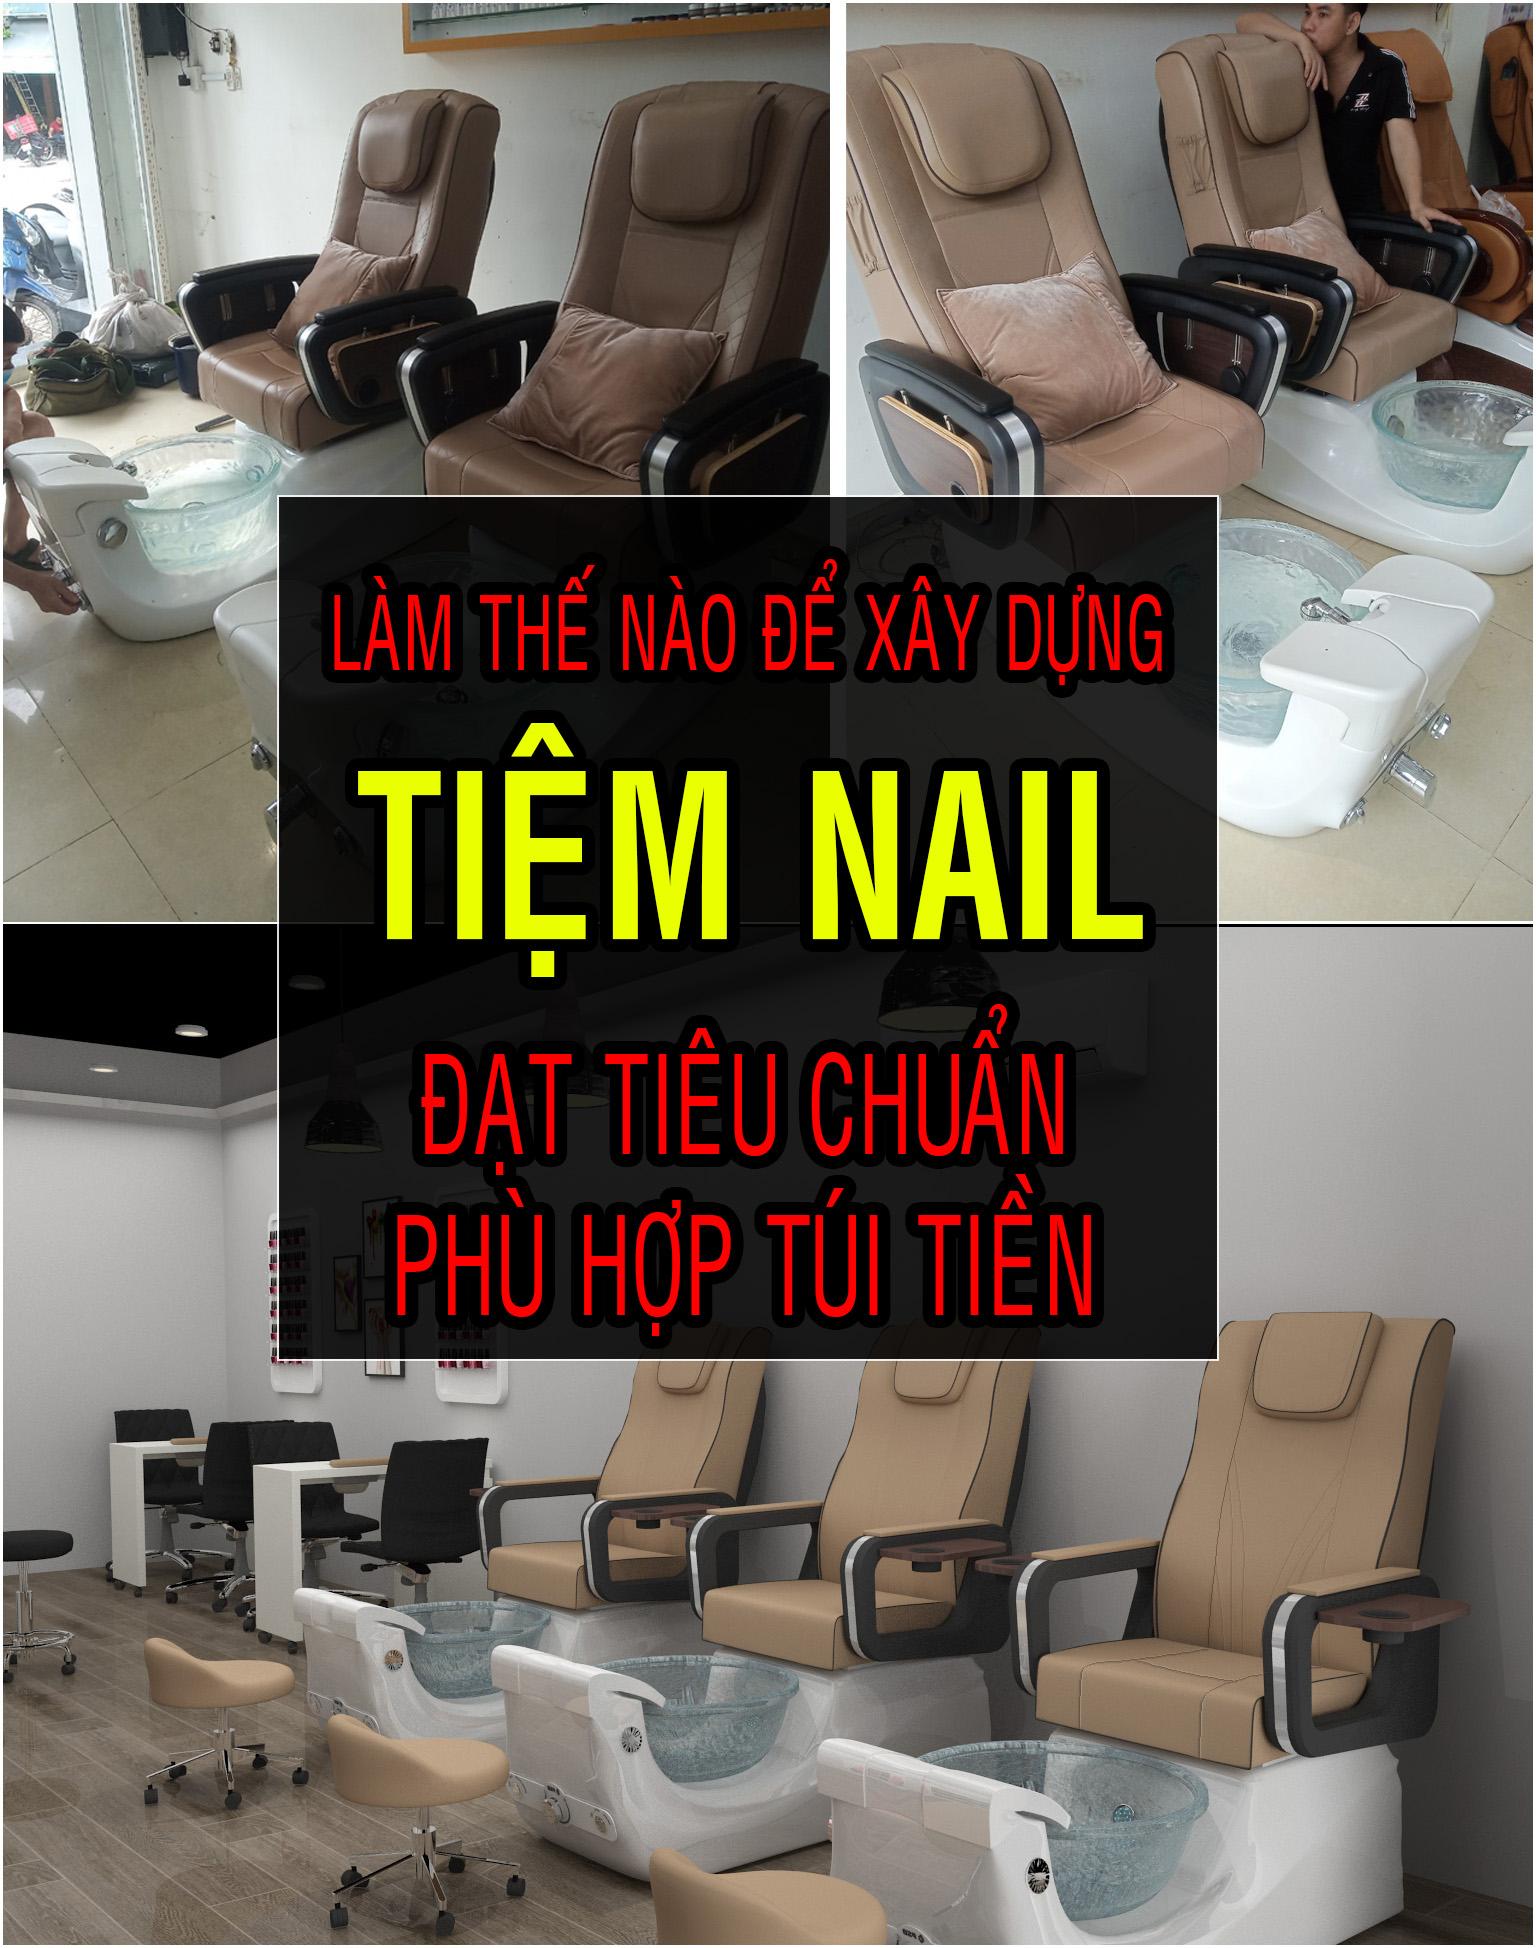 lam-the-nao-de-co-tiem-nail-dat-chuan-va-phu-hop-tui-tien